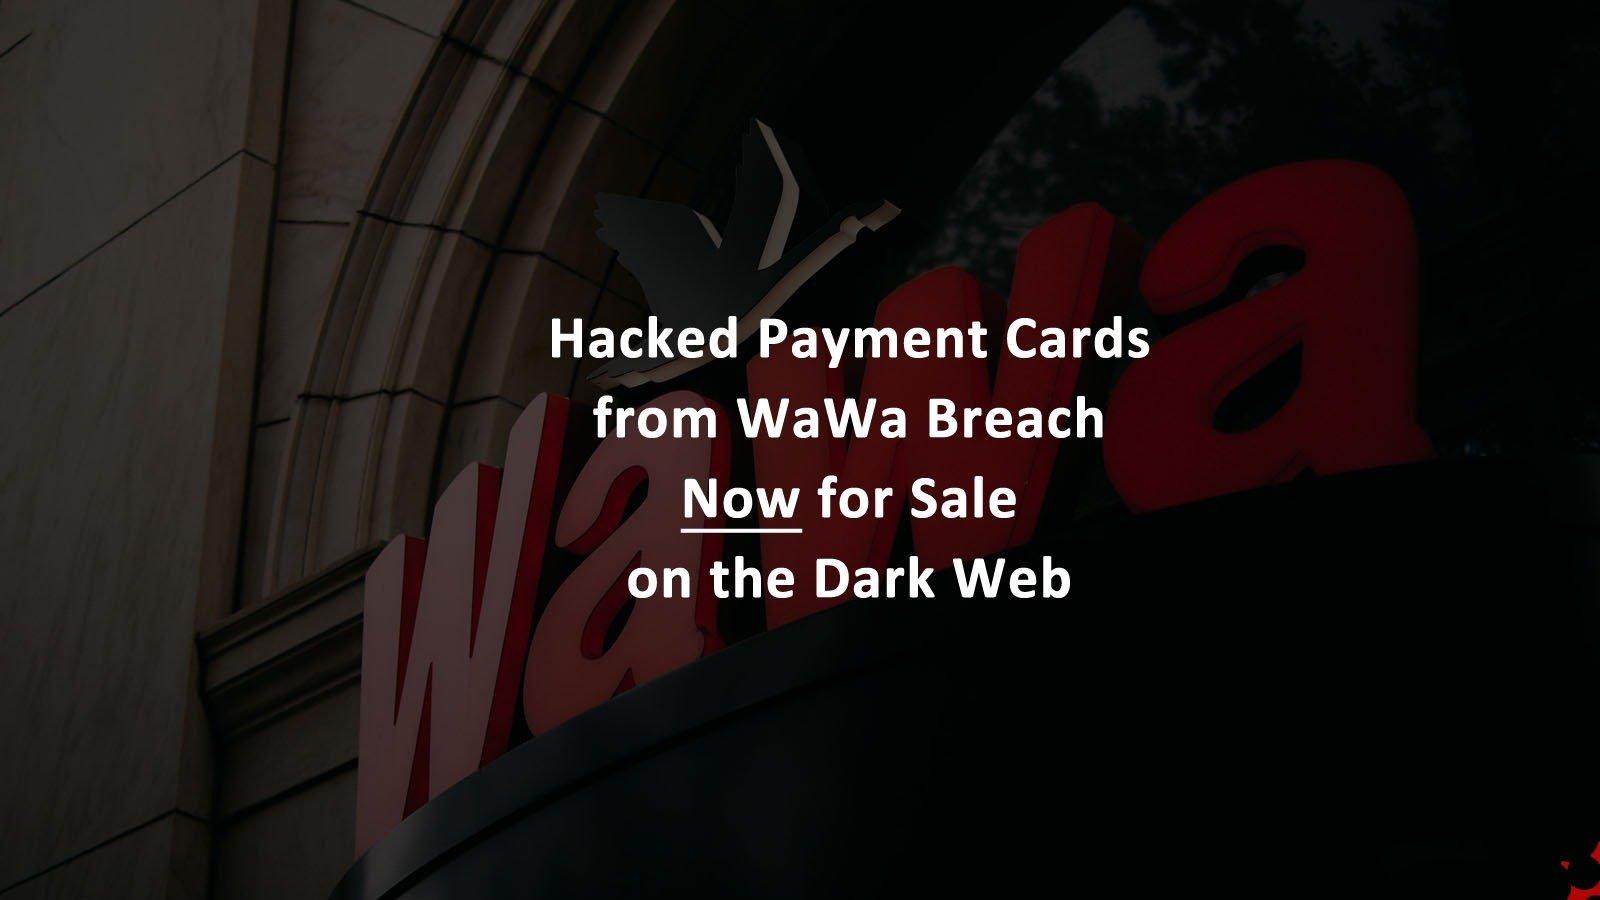 Hacked Payment Cards WaWa Data Breach Dark Web